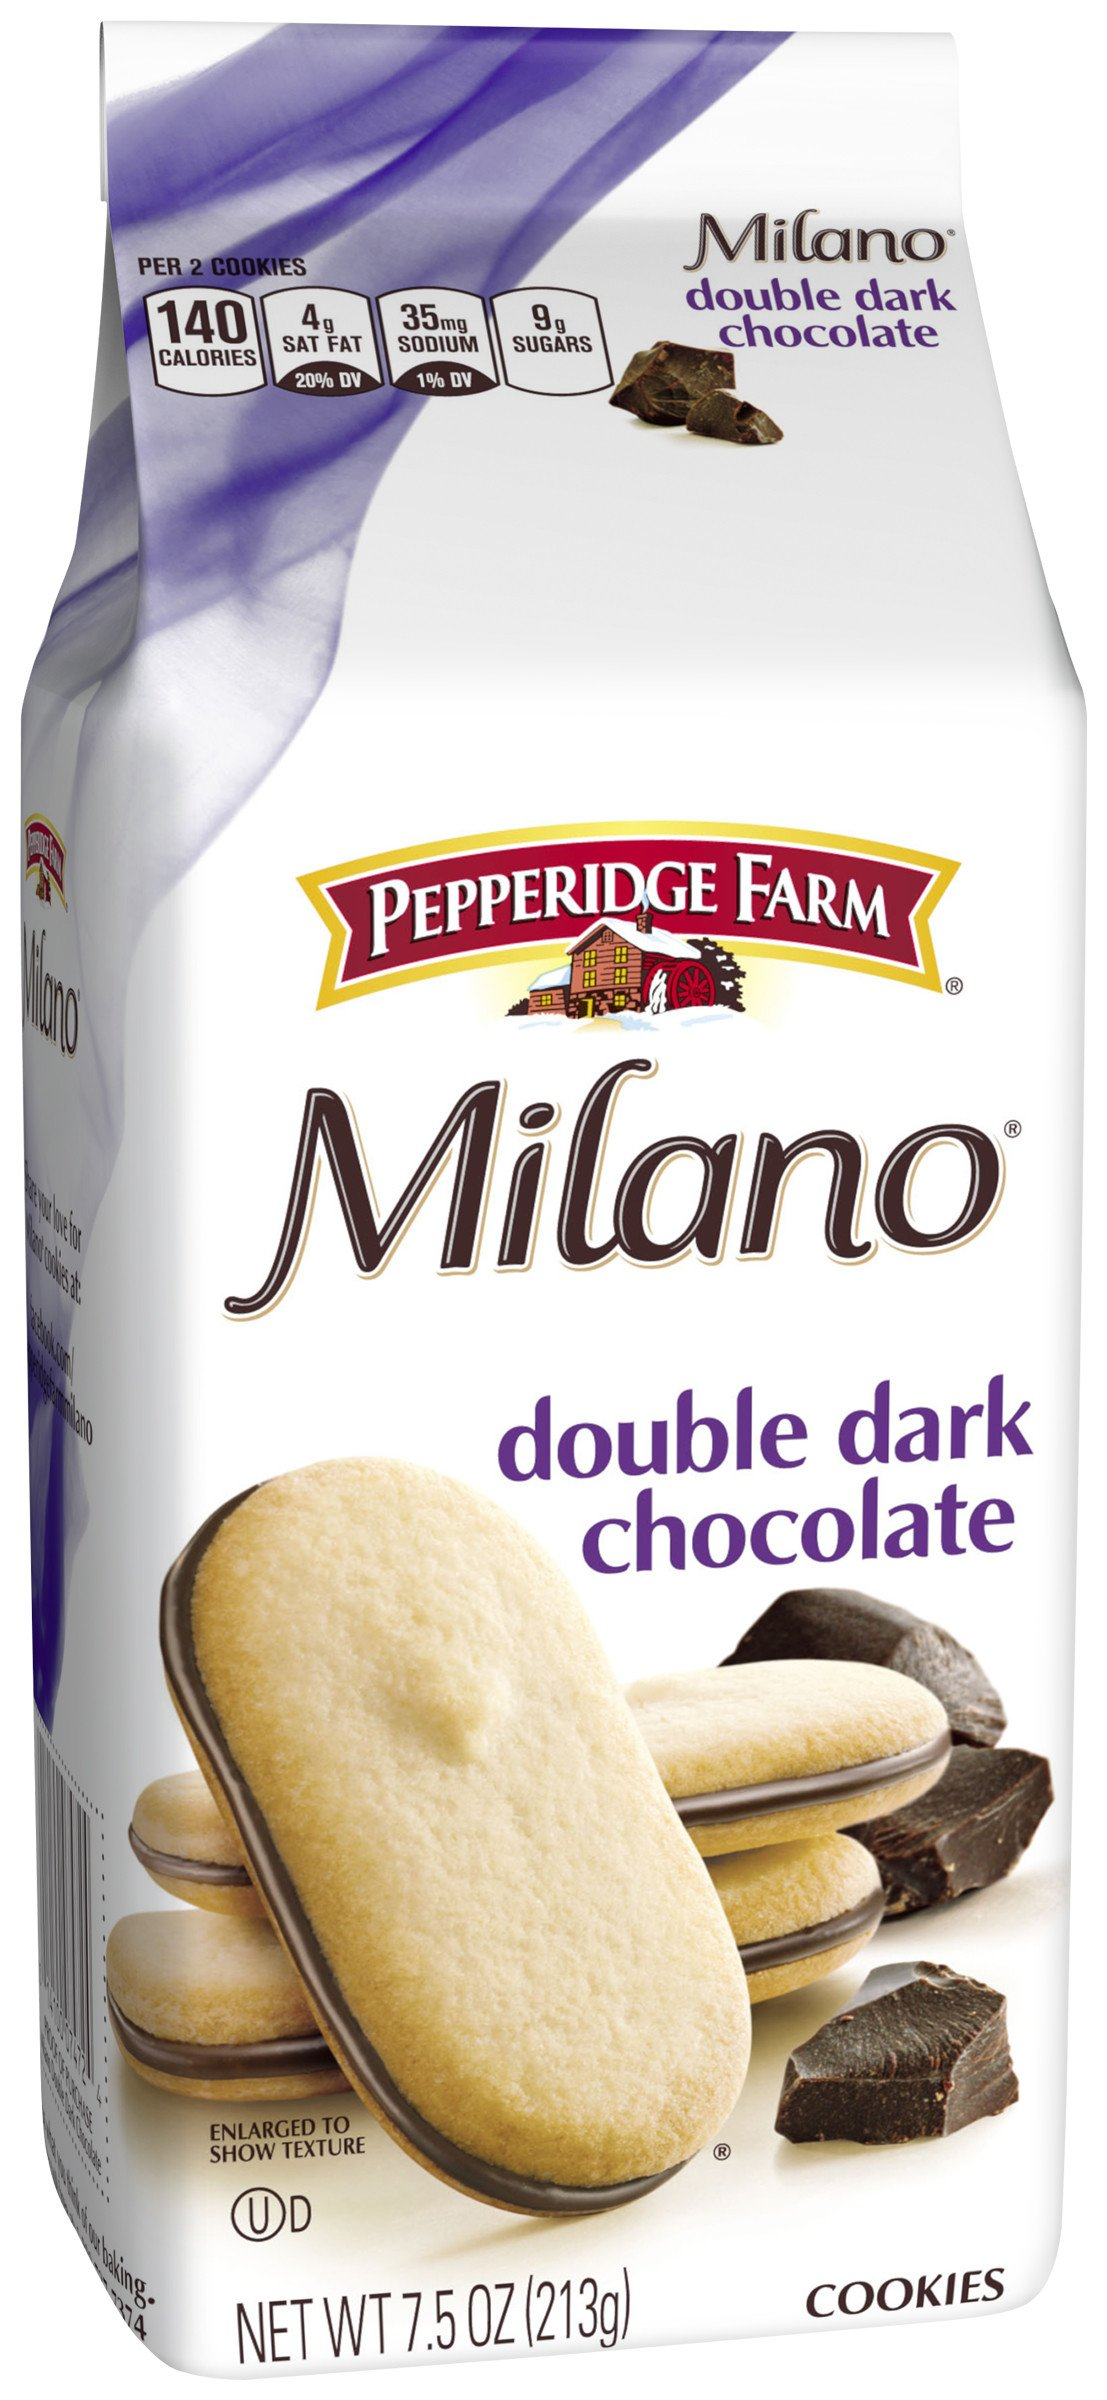 Pepperidge Farm, Milano, Cookies, Double Dark Chocolate, 7.5 oz., Bag